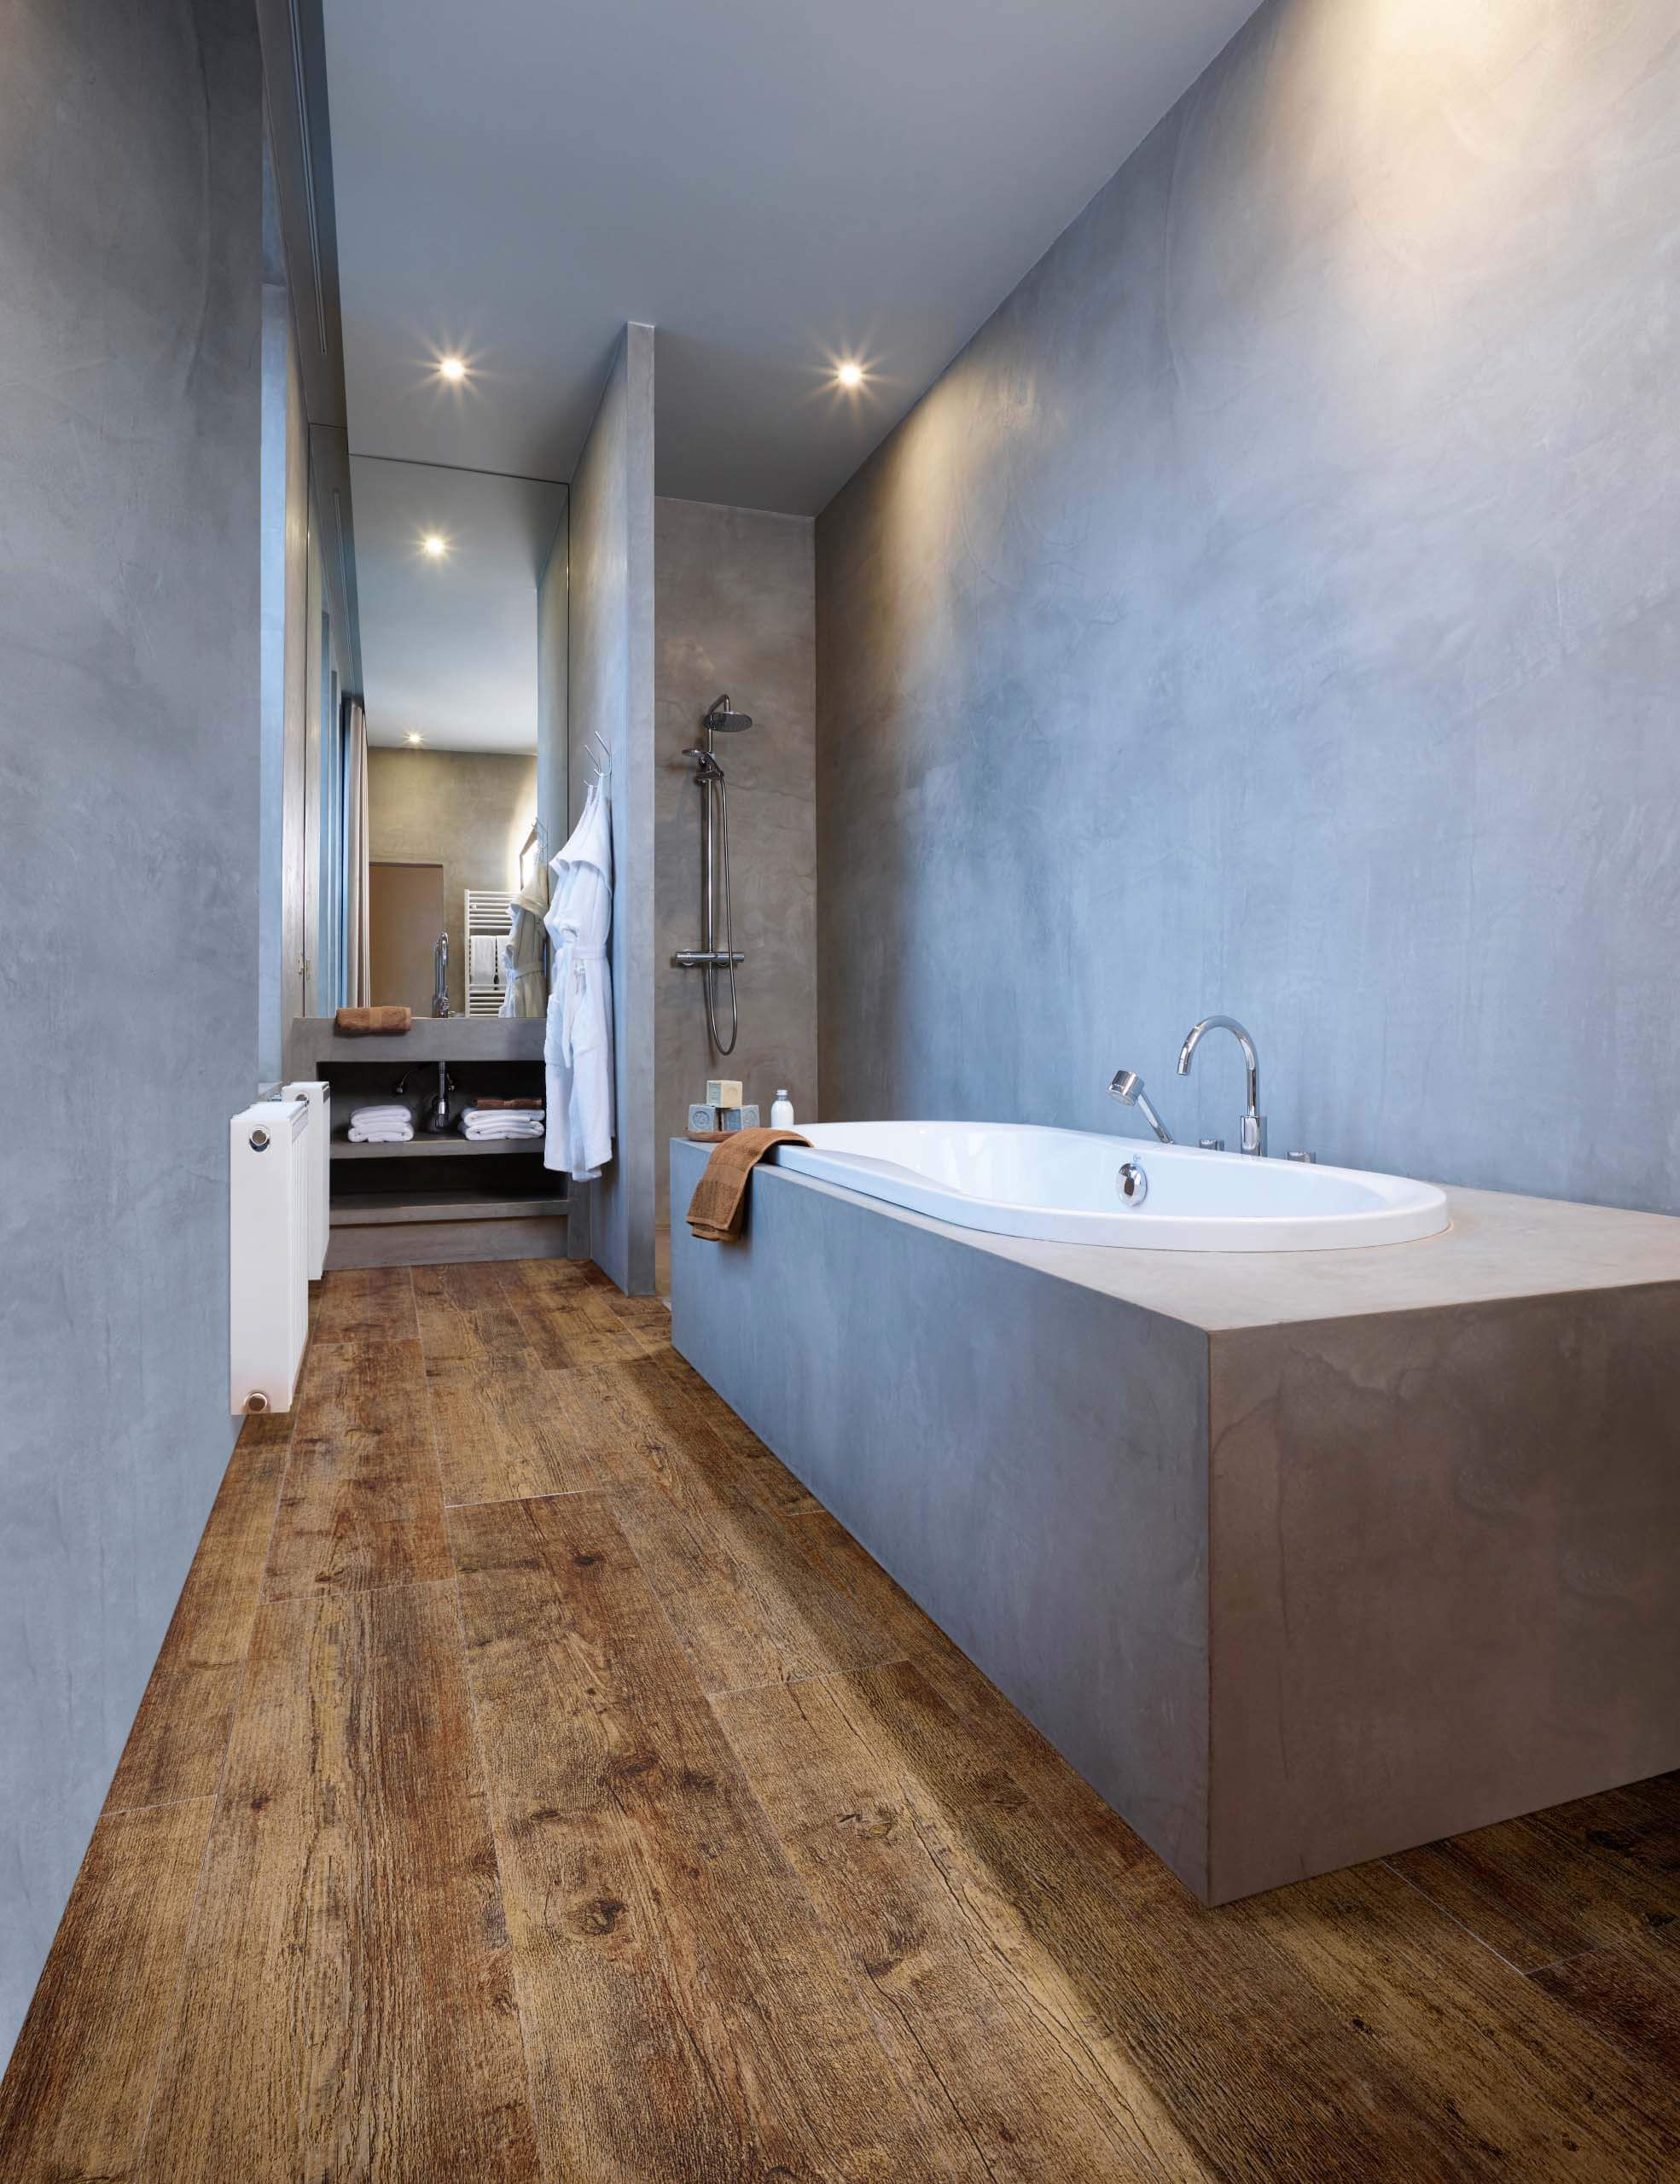 Maritime Pine 24854 Wood Effect Luxury Vinyl Flooring Moduleo Vinyl Flooring Bathroom Vinyl Flooring Kitchen Bathroom Vinyl